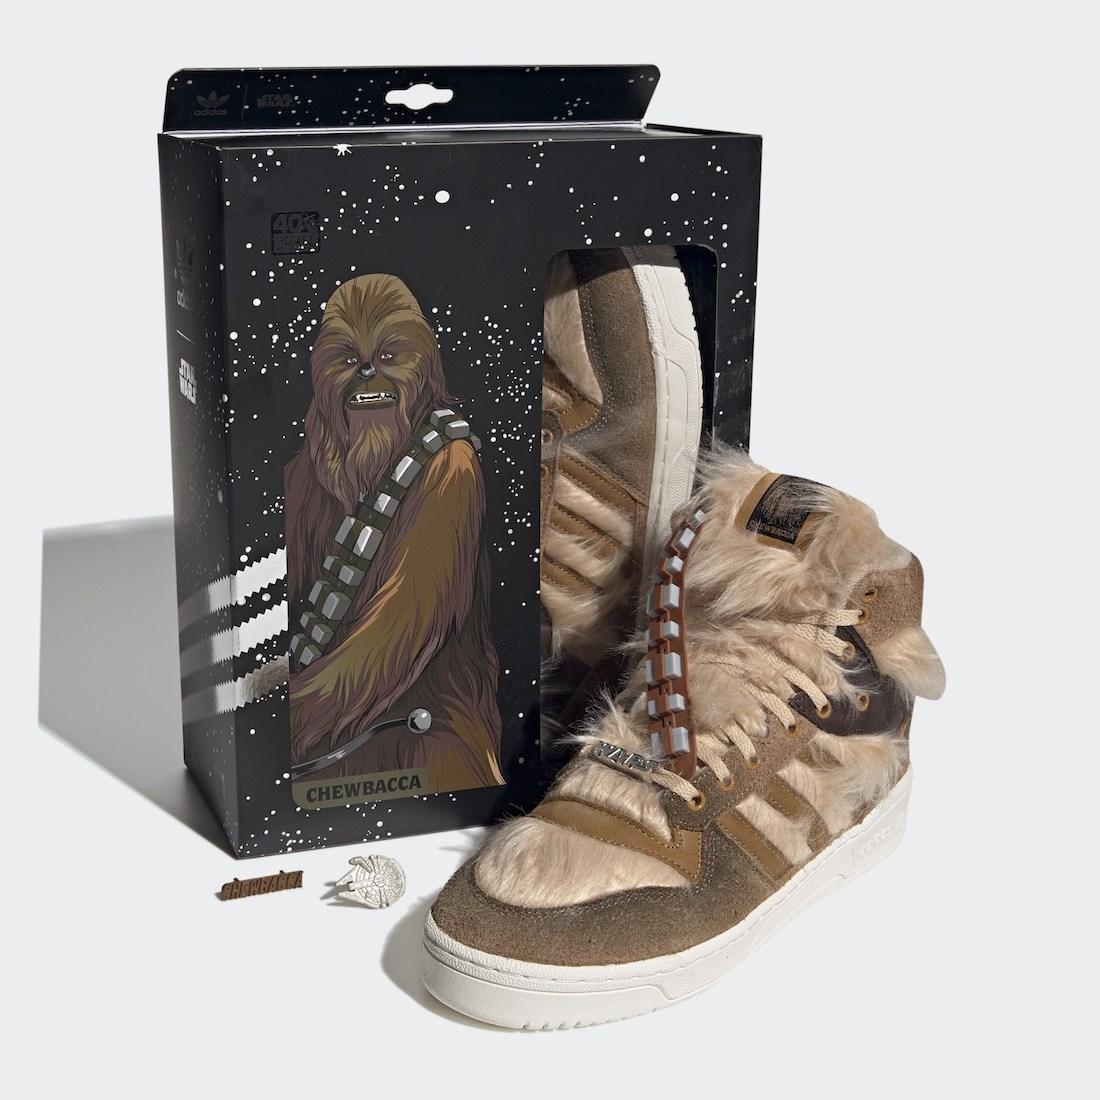 adidas,Rivalry Hi,Chewbacca,FX  「楚巴卡」再度归来!adidas Rivalry Hi 即将发售!